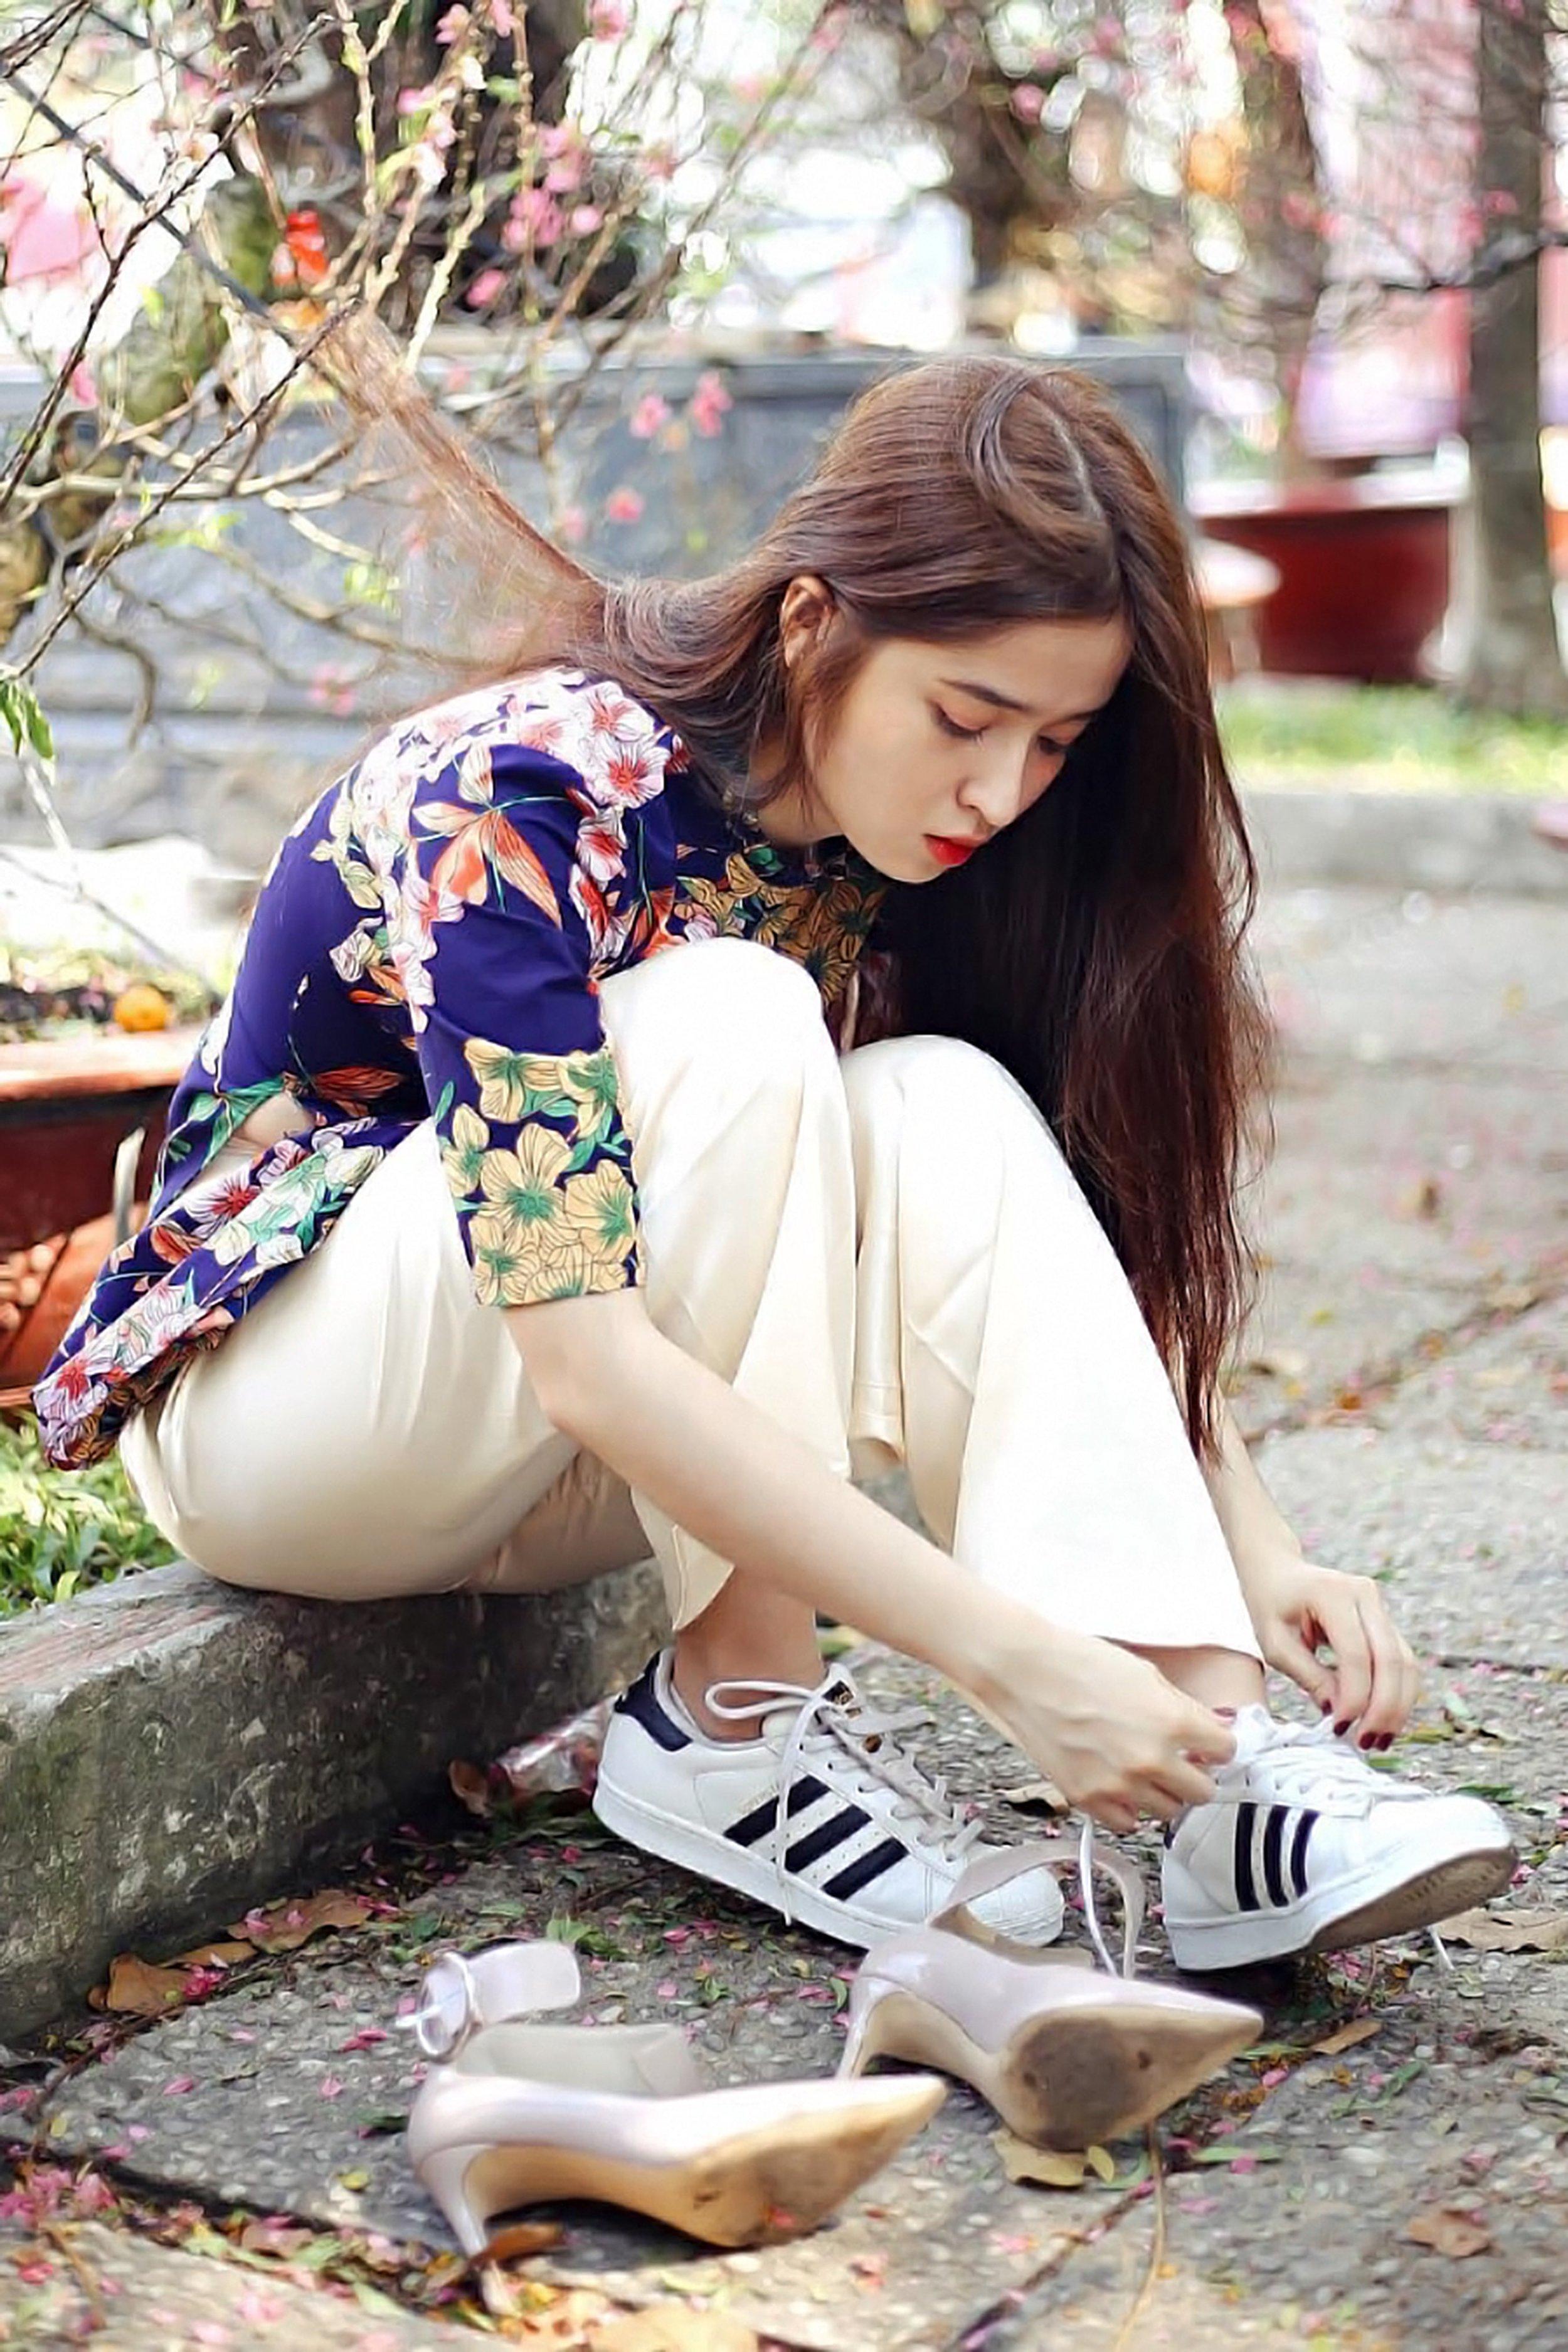 adidas-attractive-beautiful-2090887.jpg